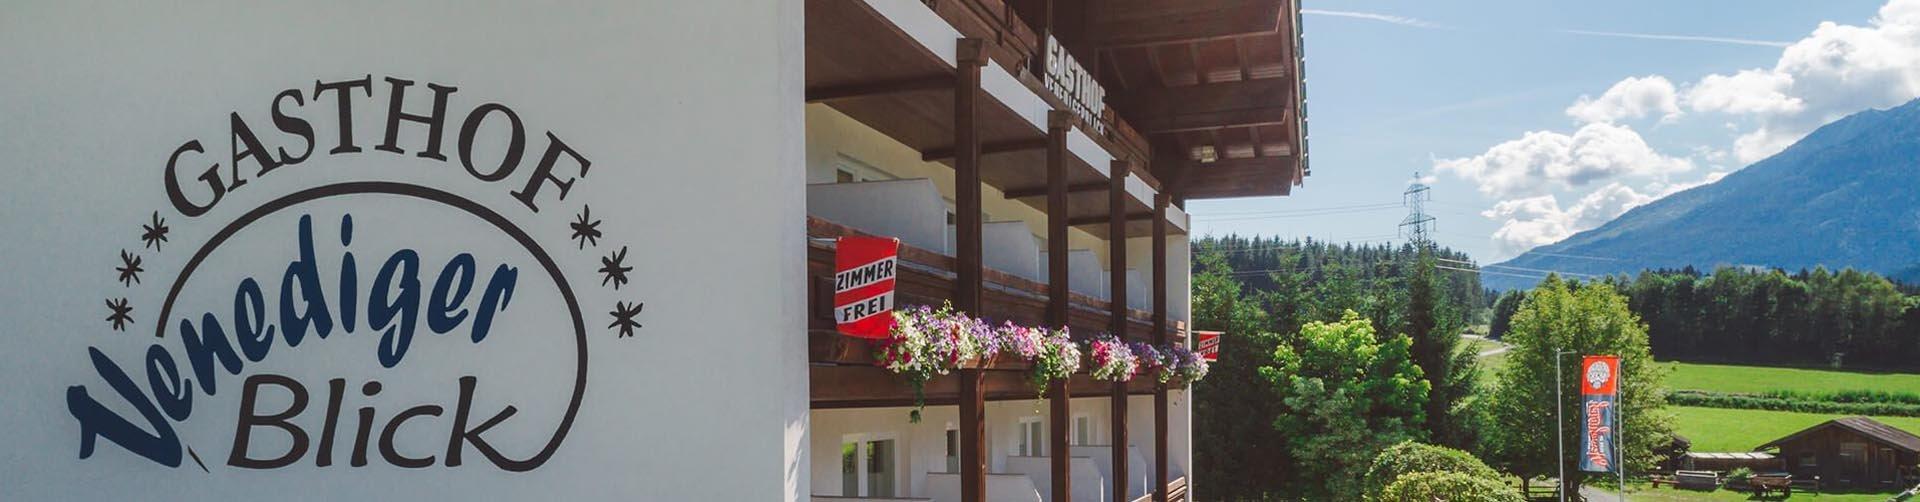 Gasthof Venedigerblick in Neukirchen